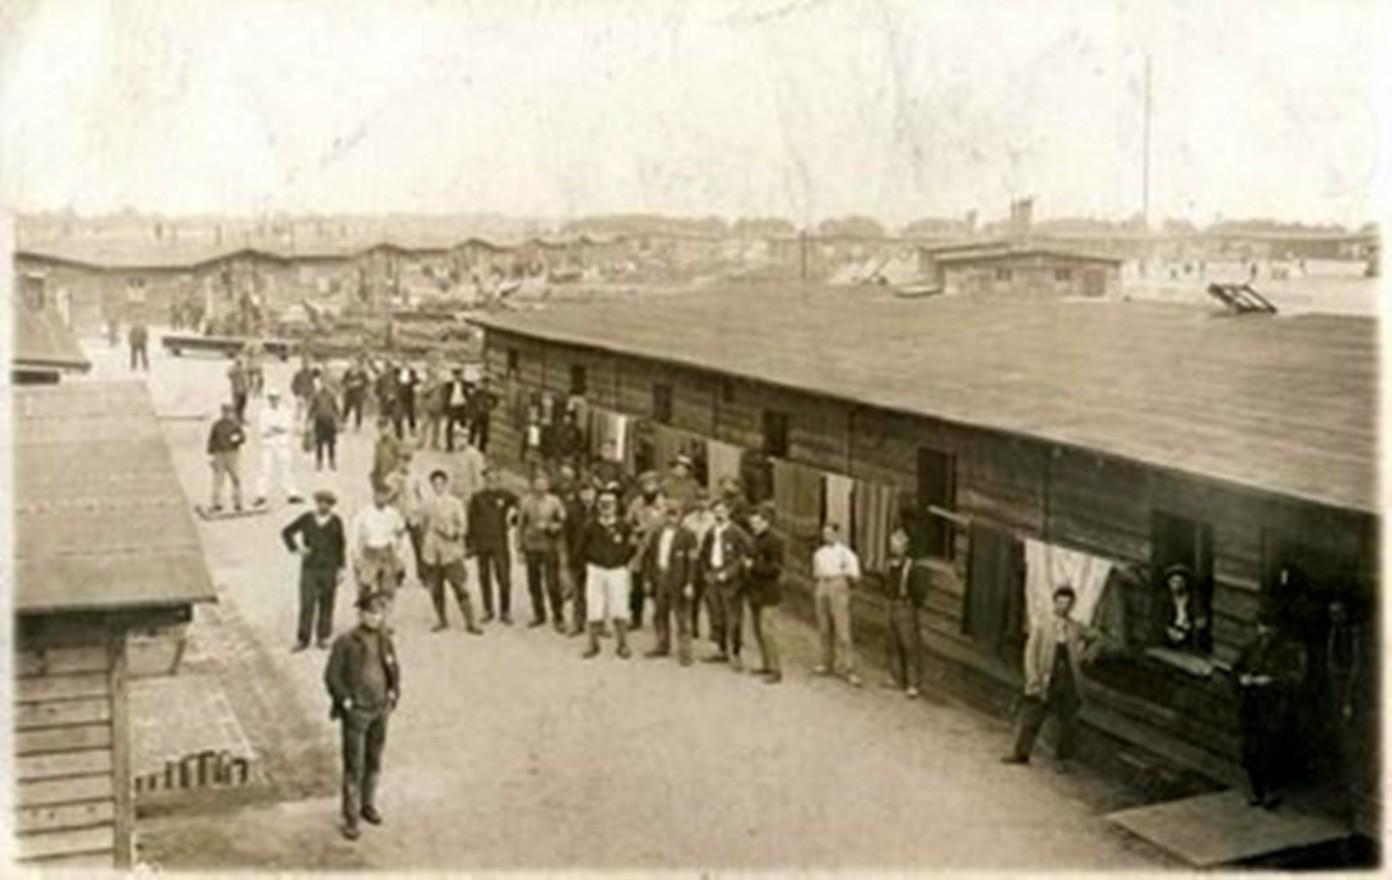 2 friedrichsfeld02 baraques